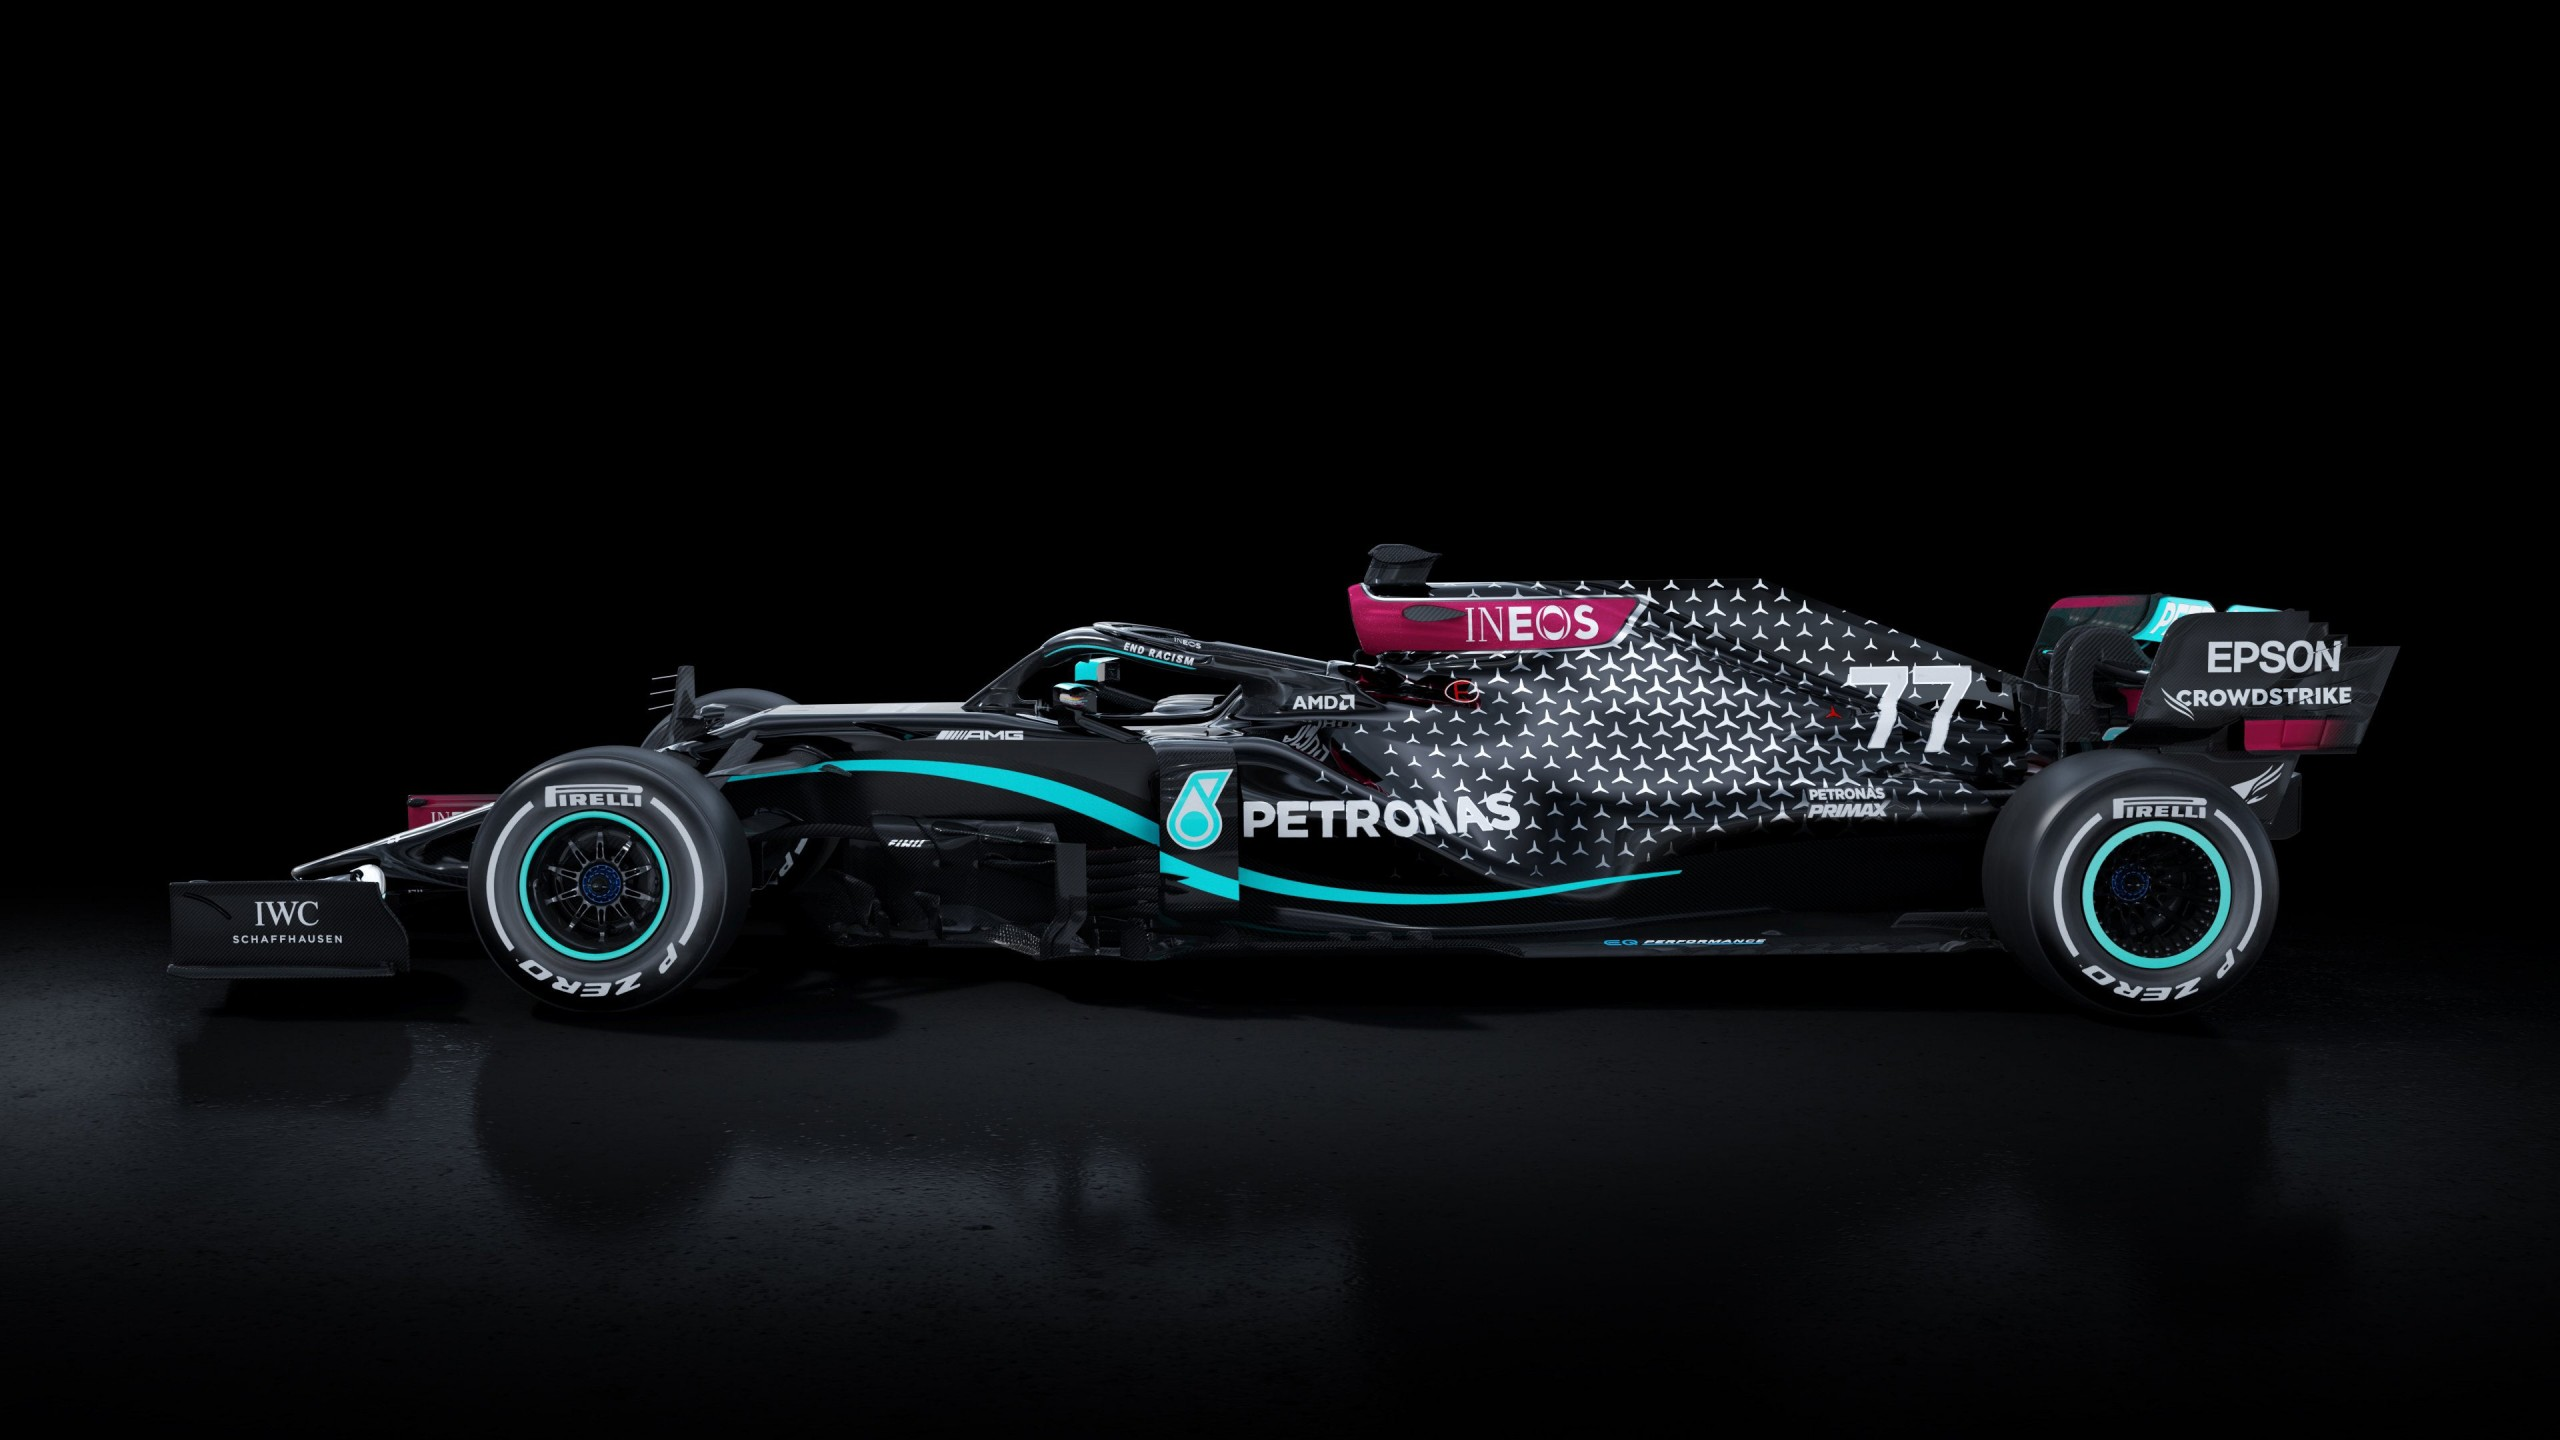 Mercedes AMG F1 W11 EQ Performance 2020 4K Wallpaper HD Car 2560x1440